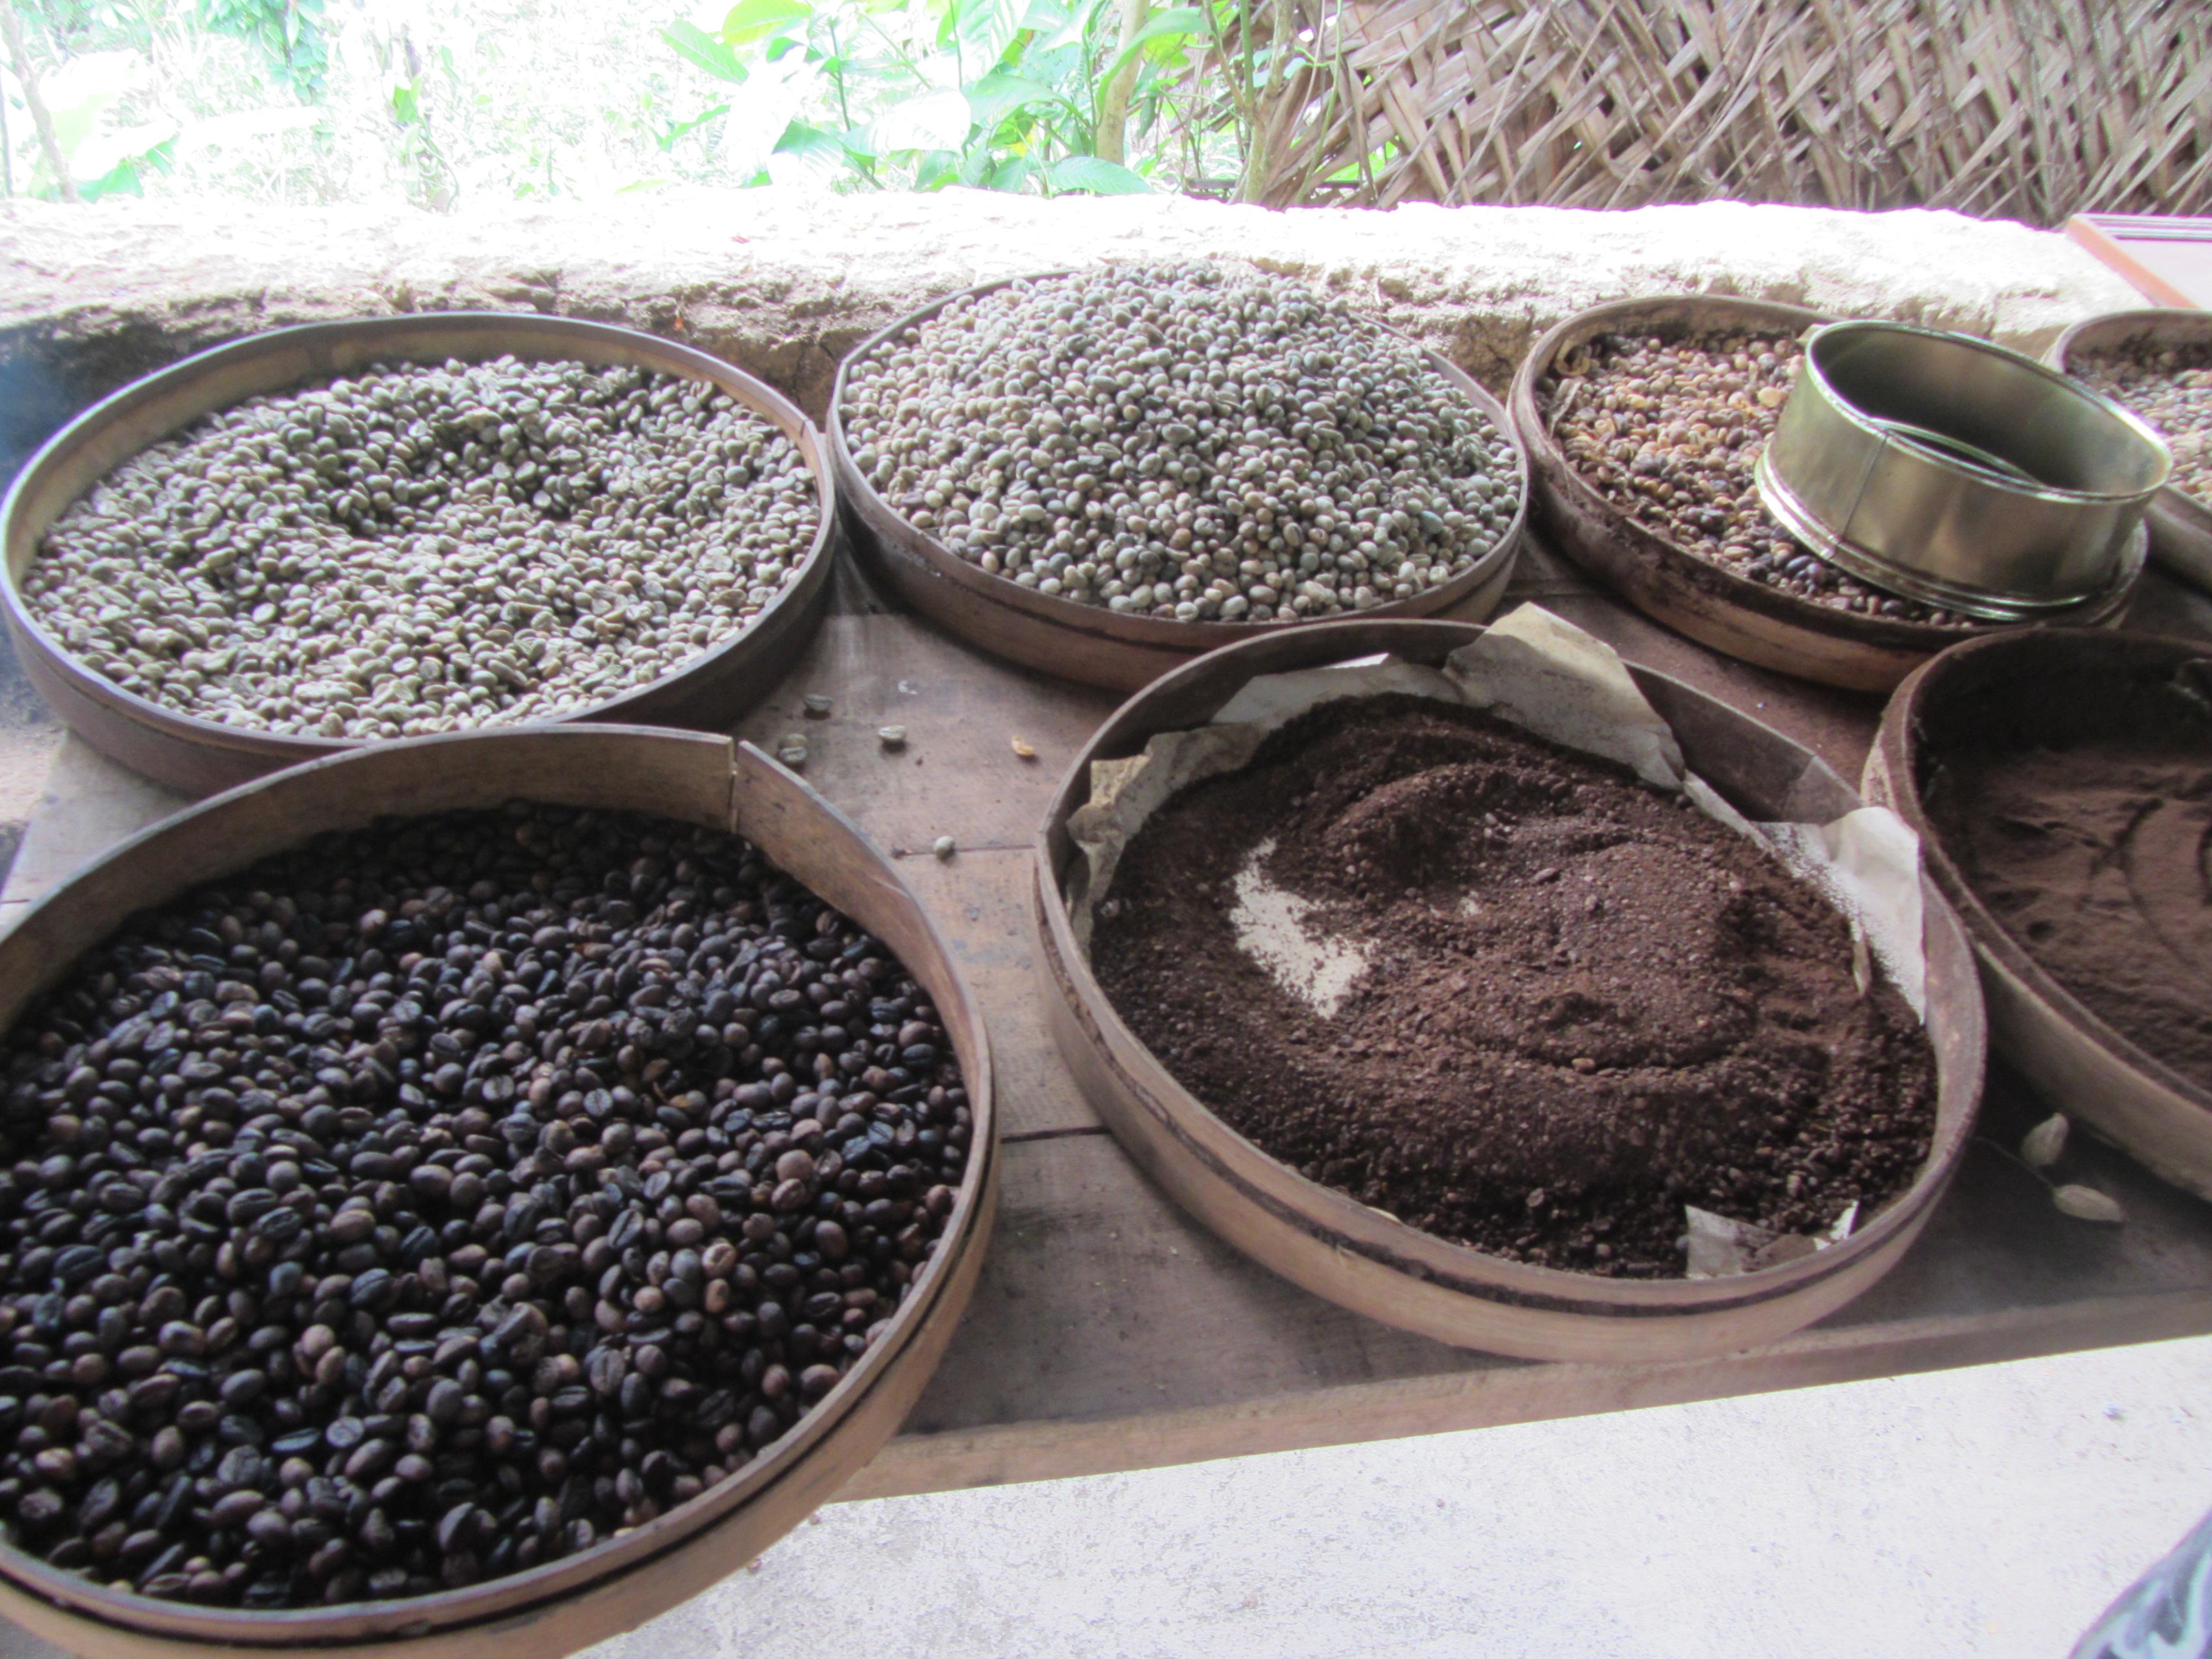 FileCoffee Beans In Bali